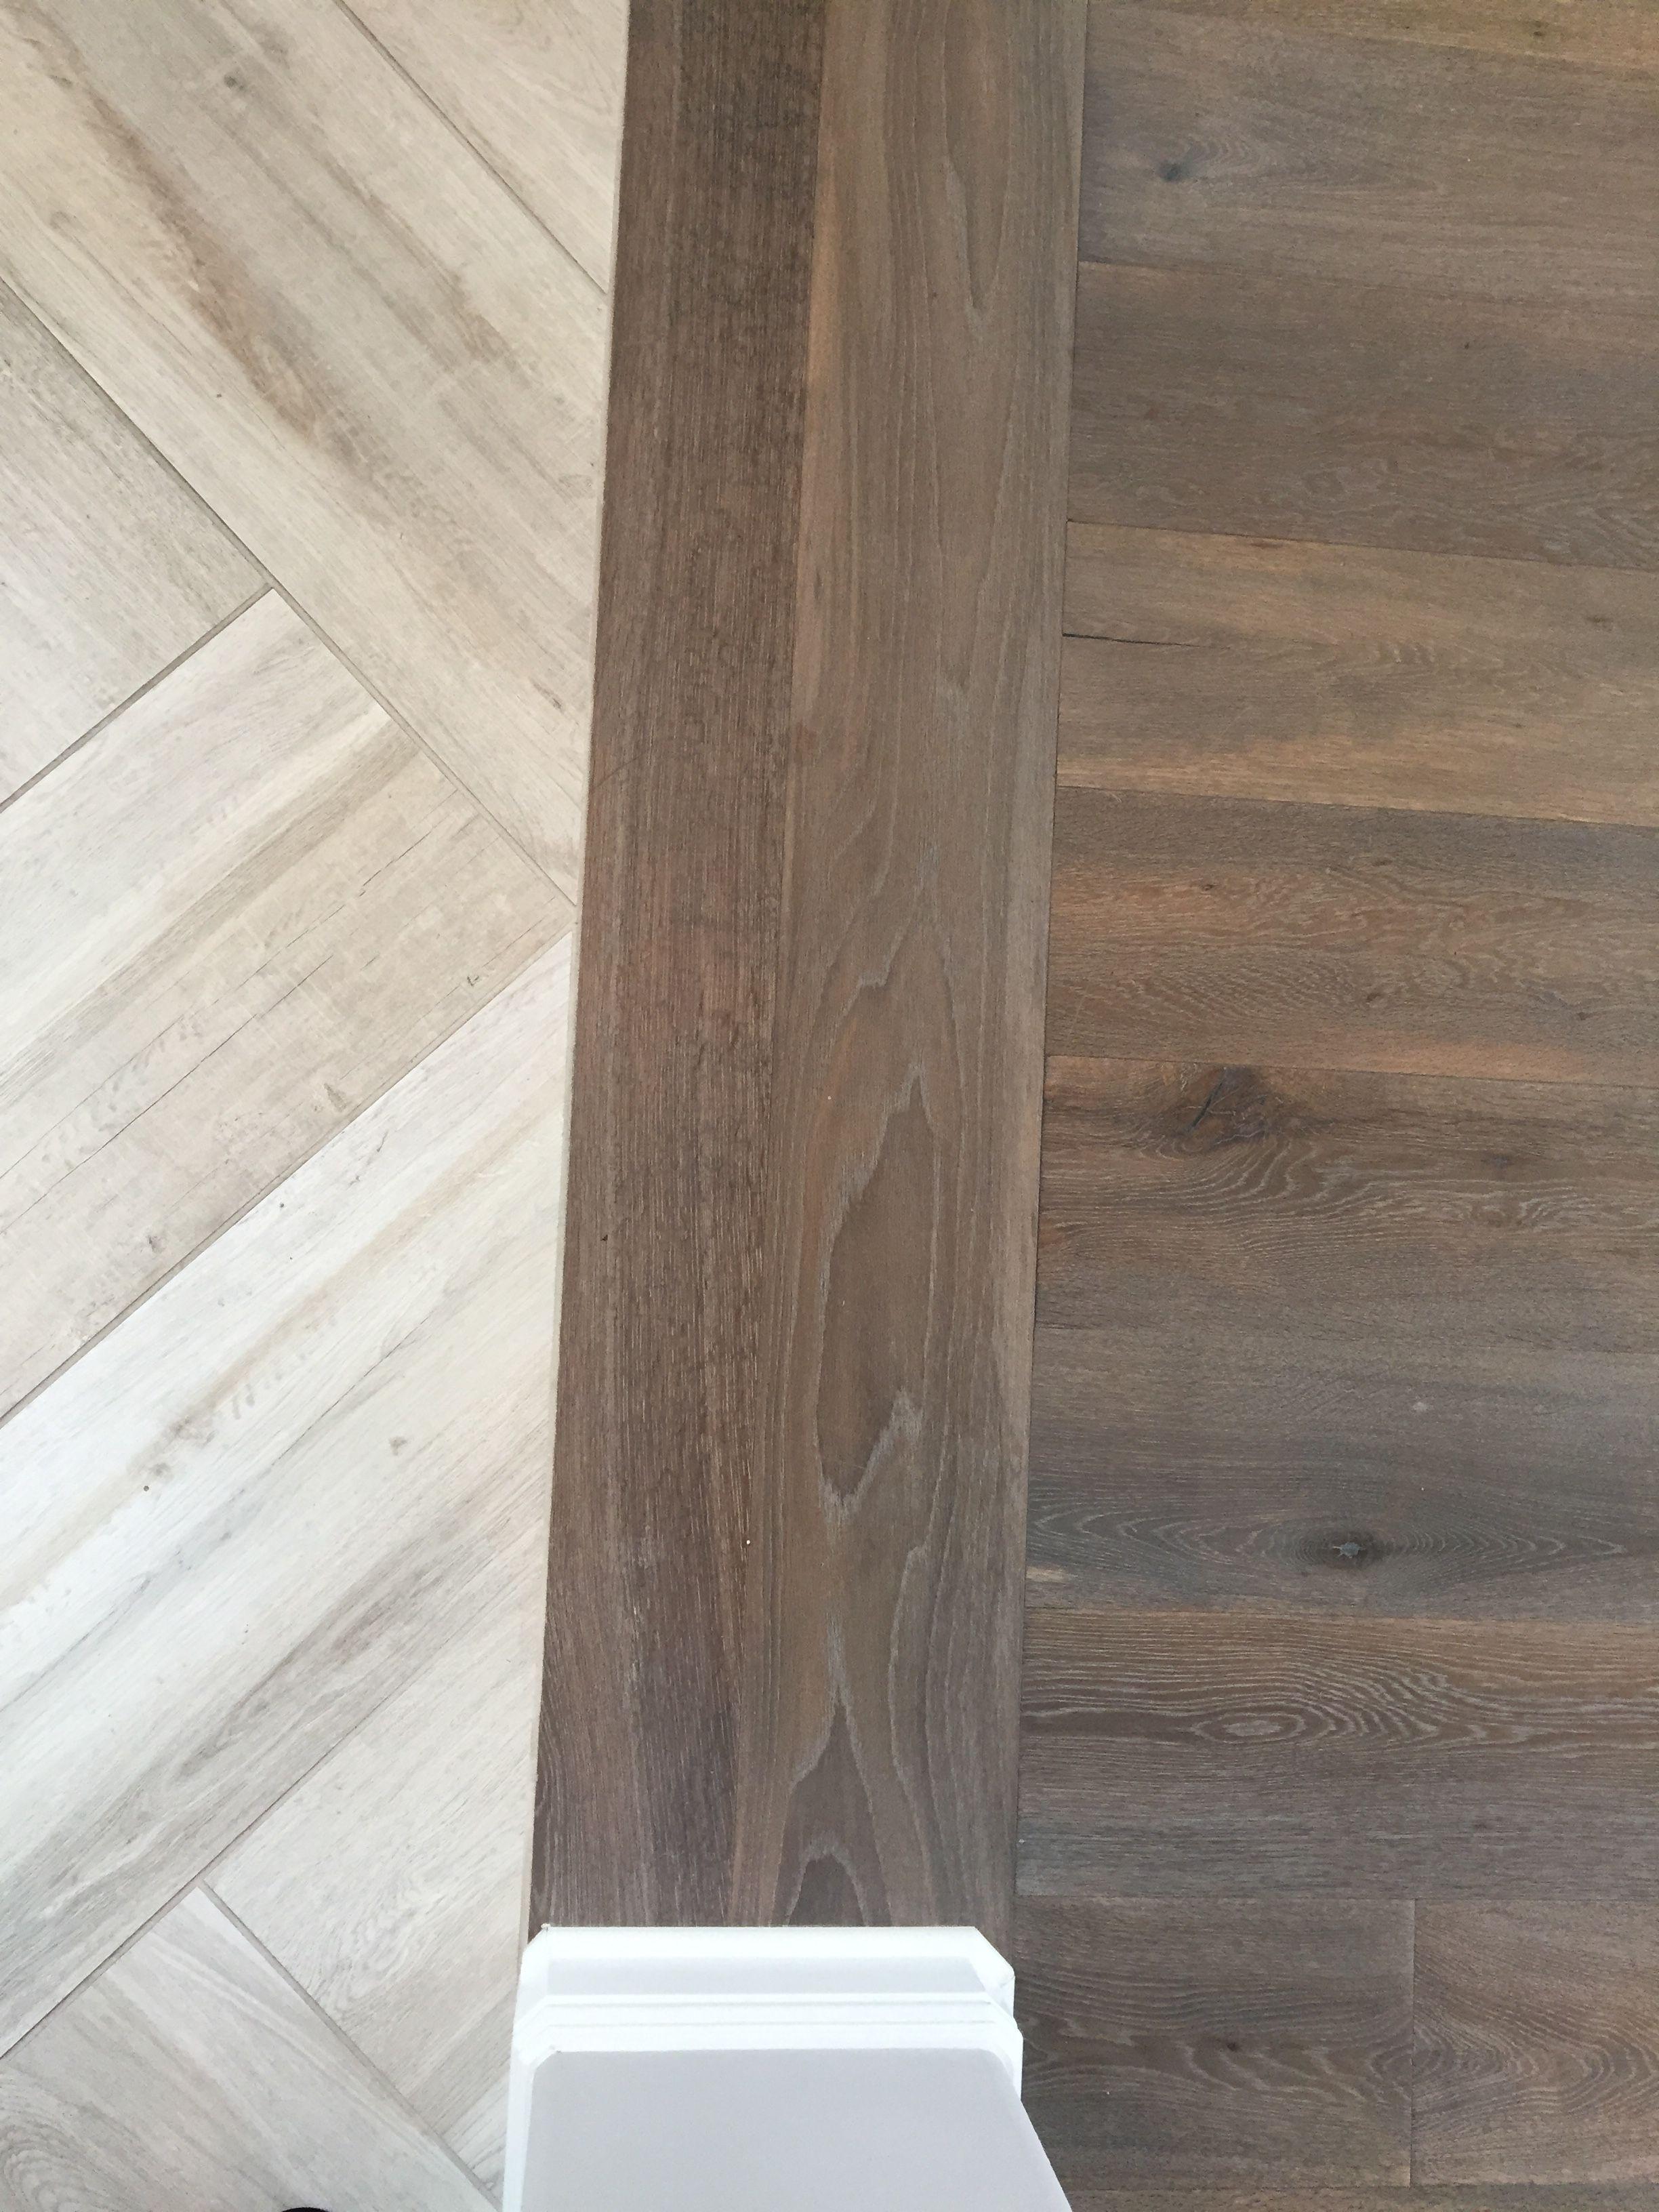 hardwood floor fireplace transition of floor transition laminate to herringbone tile pattern model intended for floor transition laminate to herringbone tile pattern herringbone tile pattern herringbone wood floor